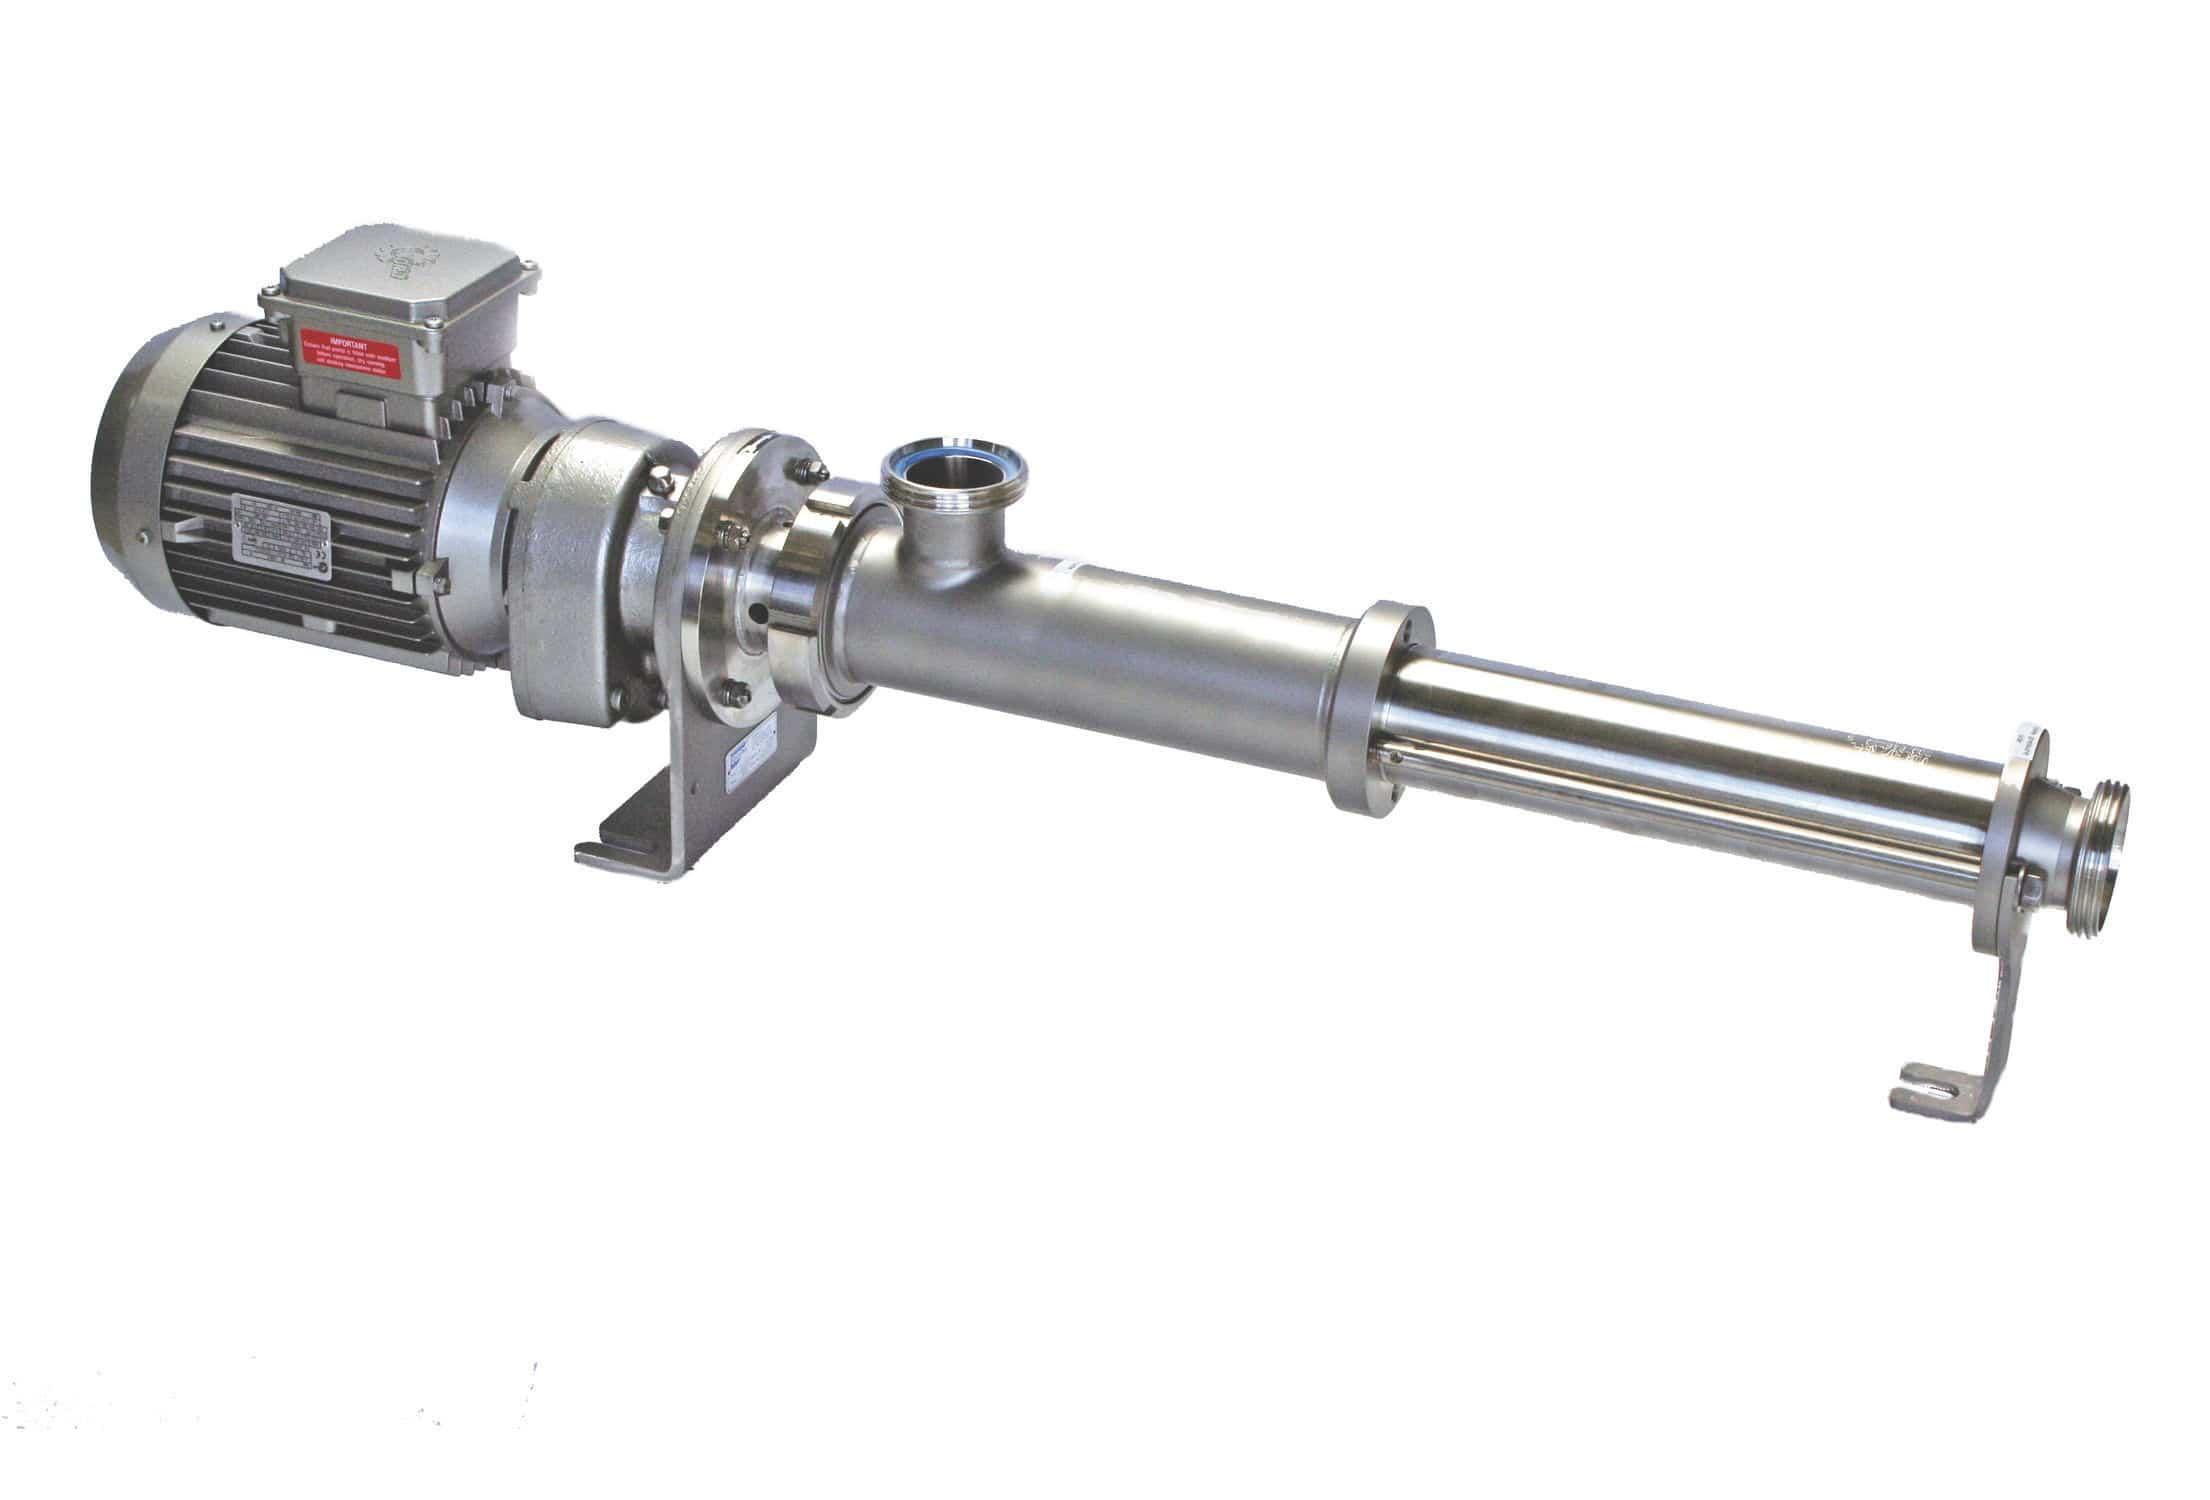 Sistema de dosificación volumétrico rotativo mediante tecnologia de husillo